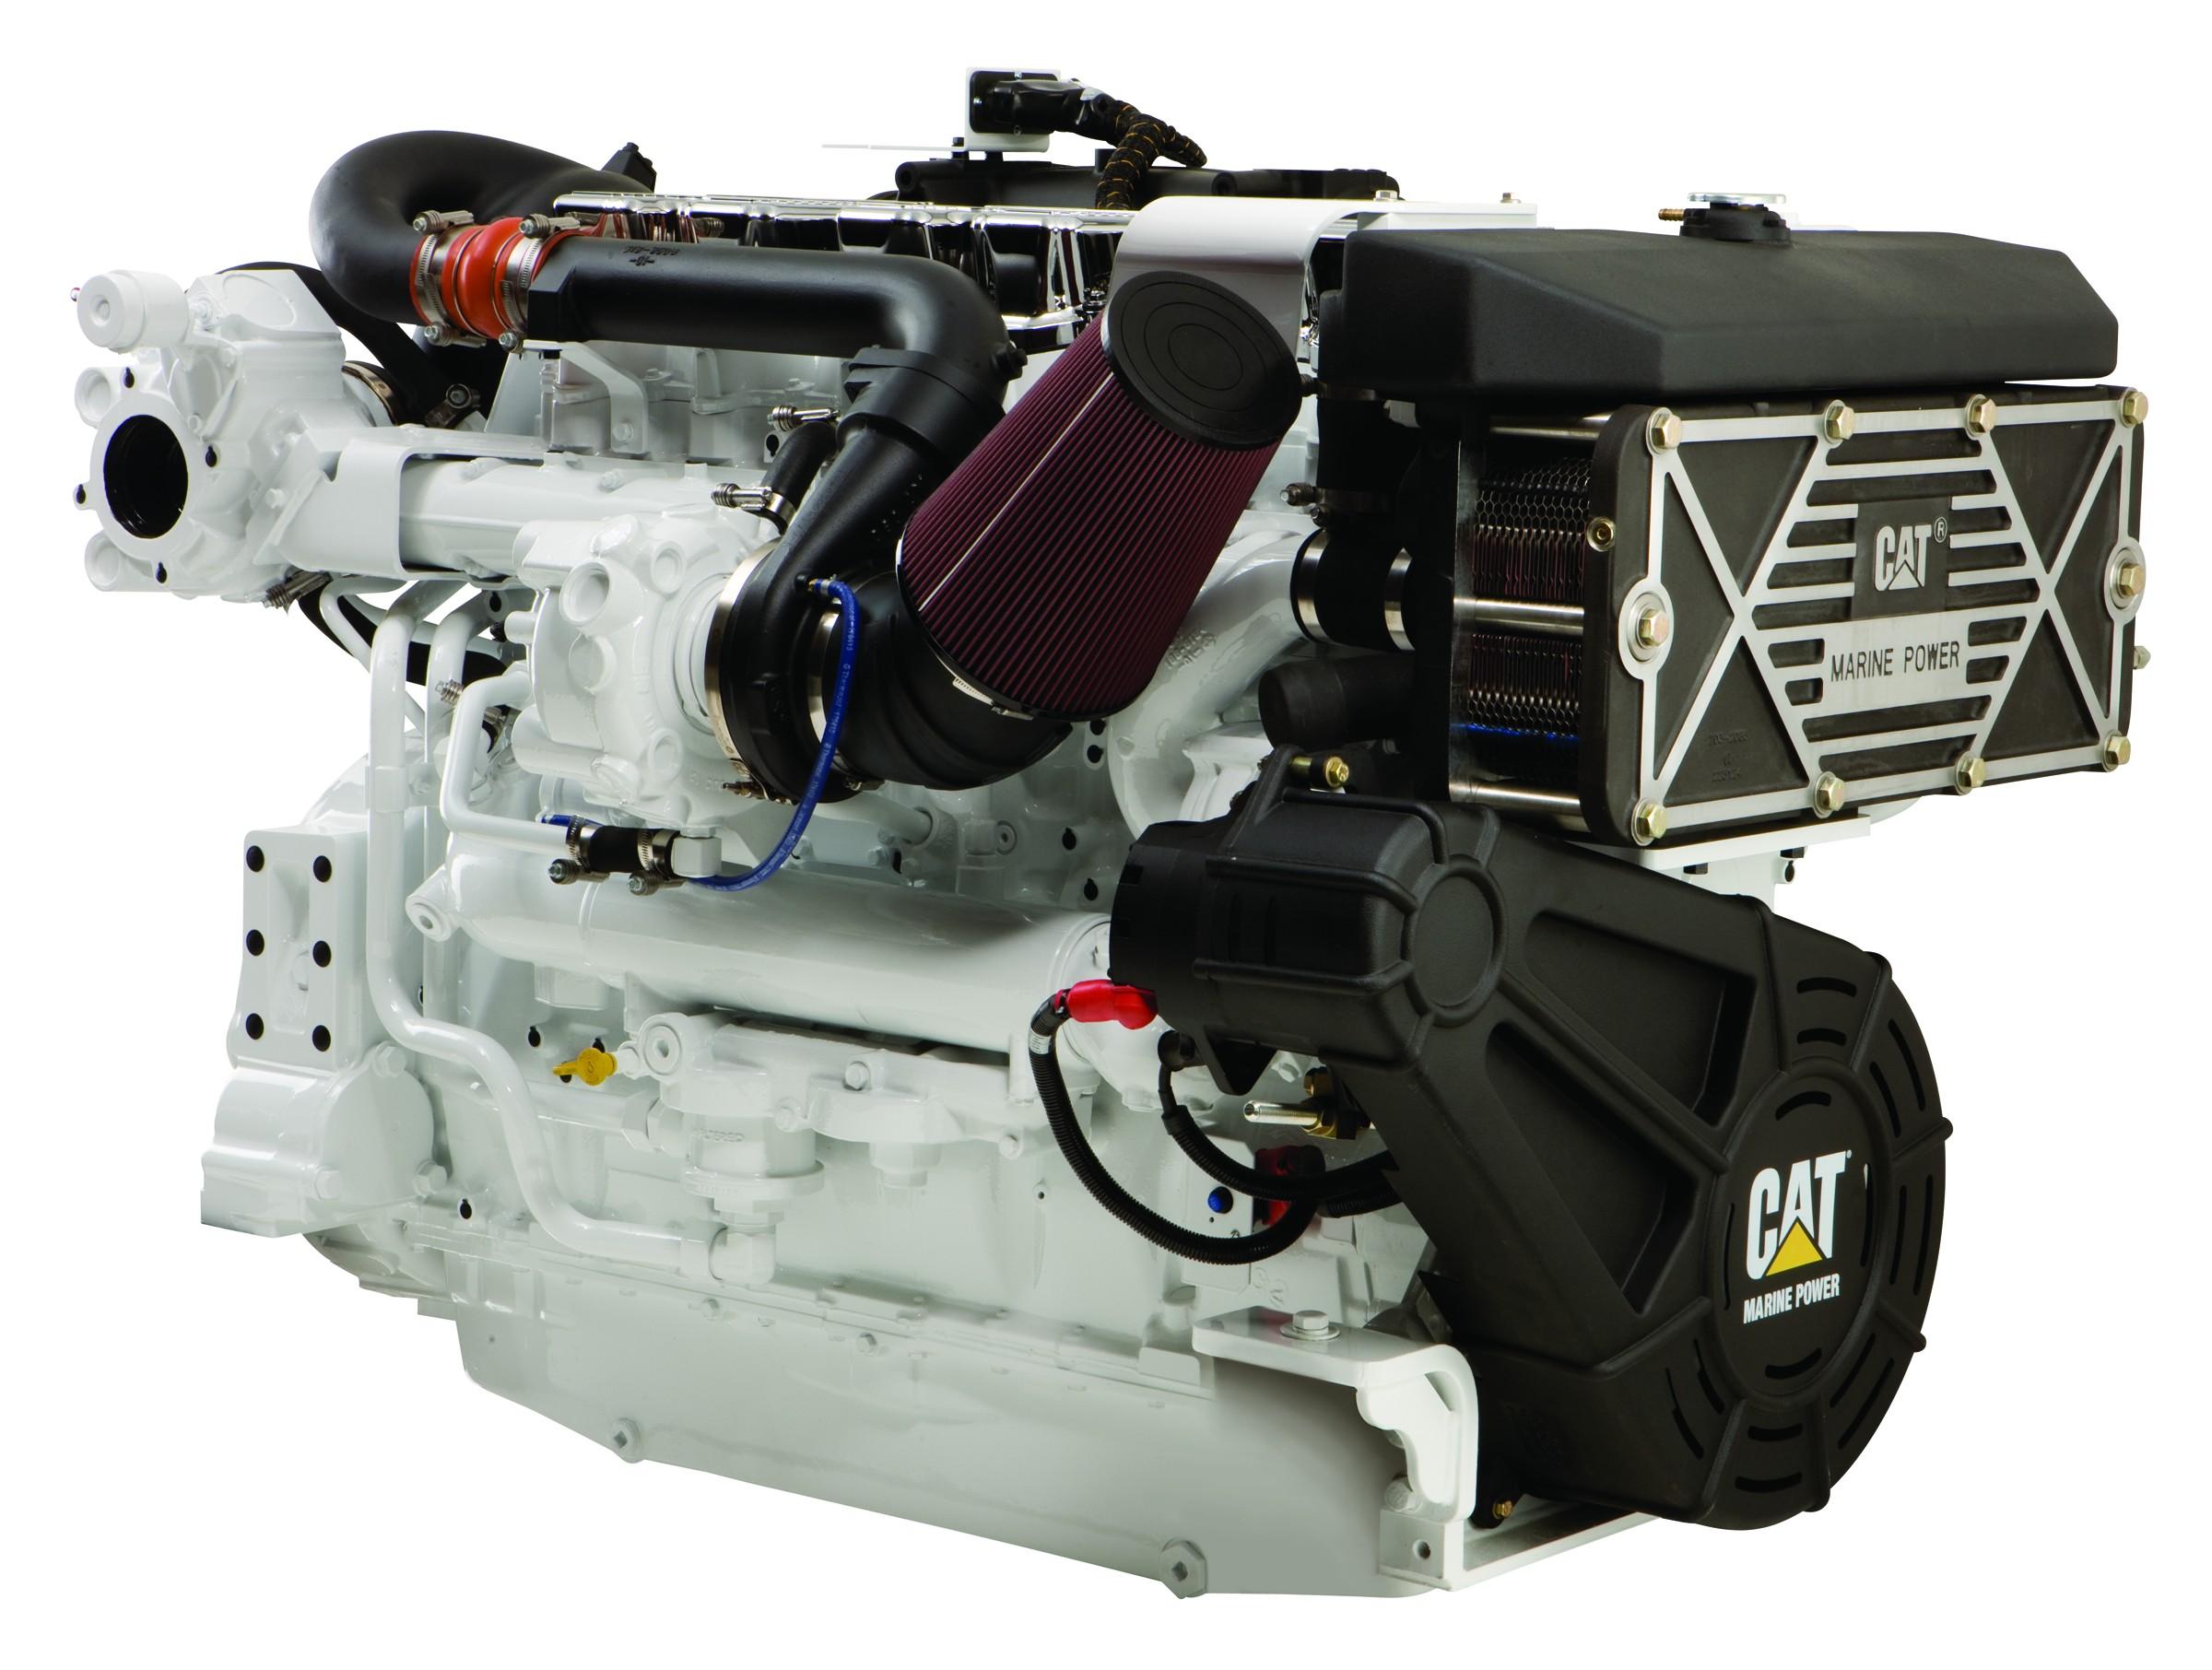 Caterpillar Marine Engines C18 For Sale Old Marine Engines